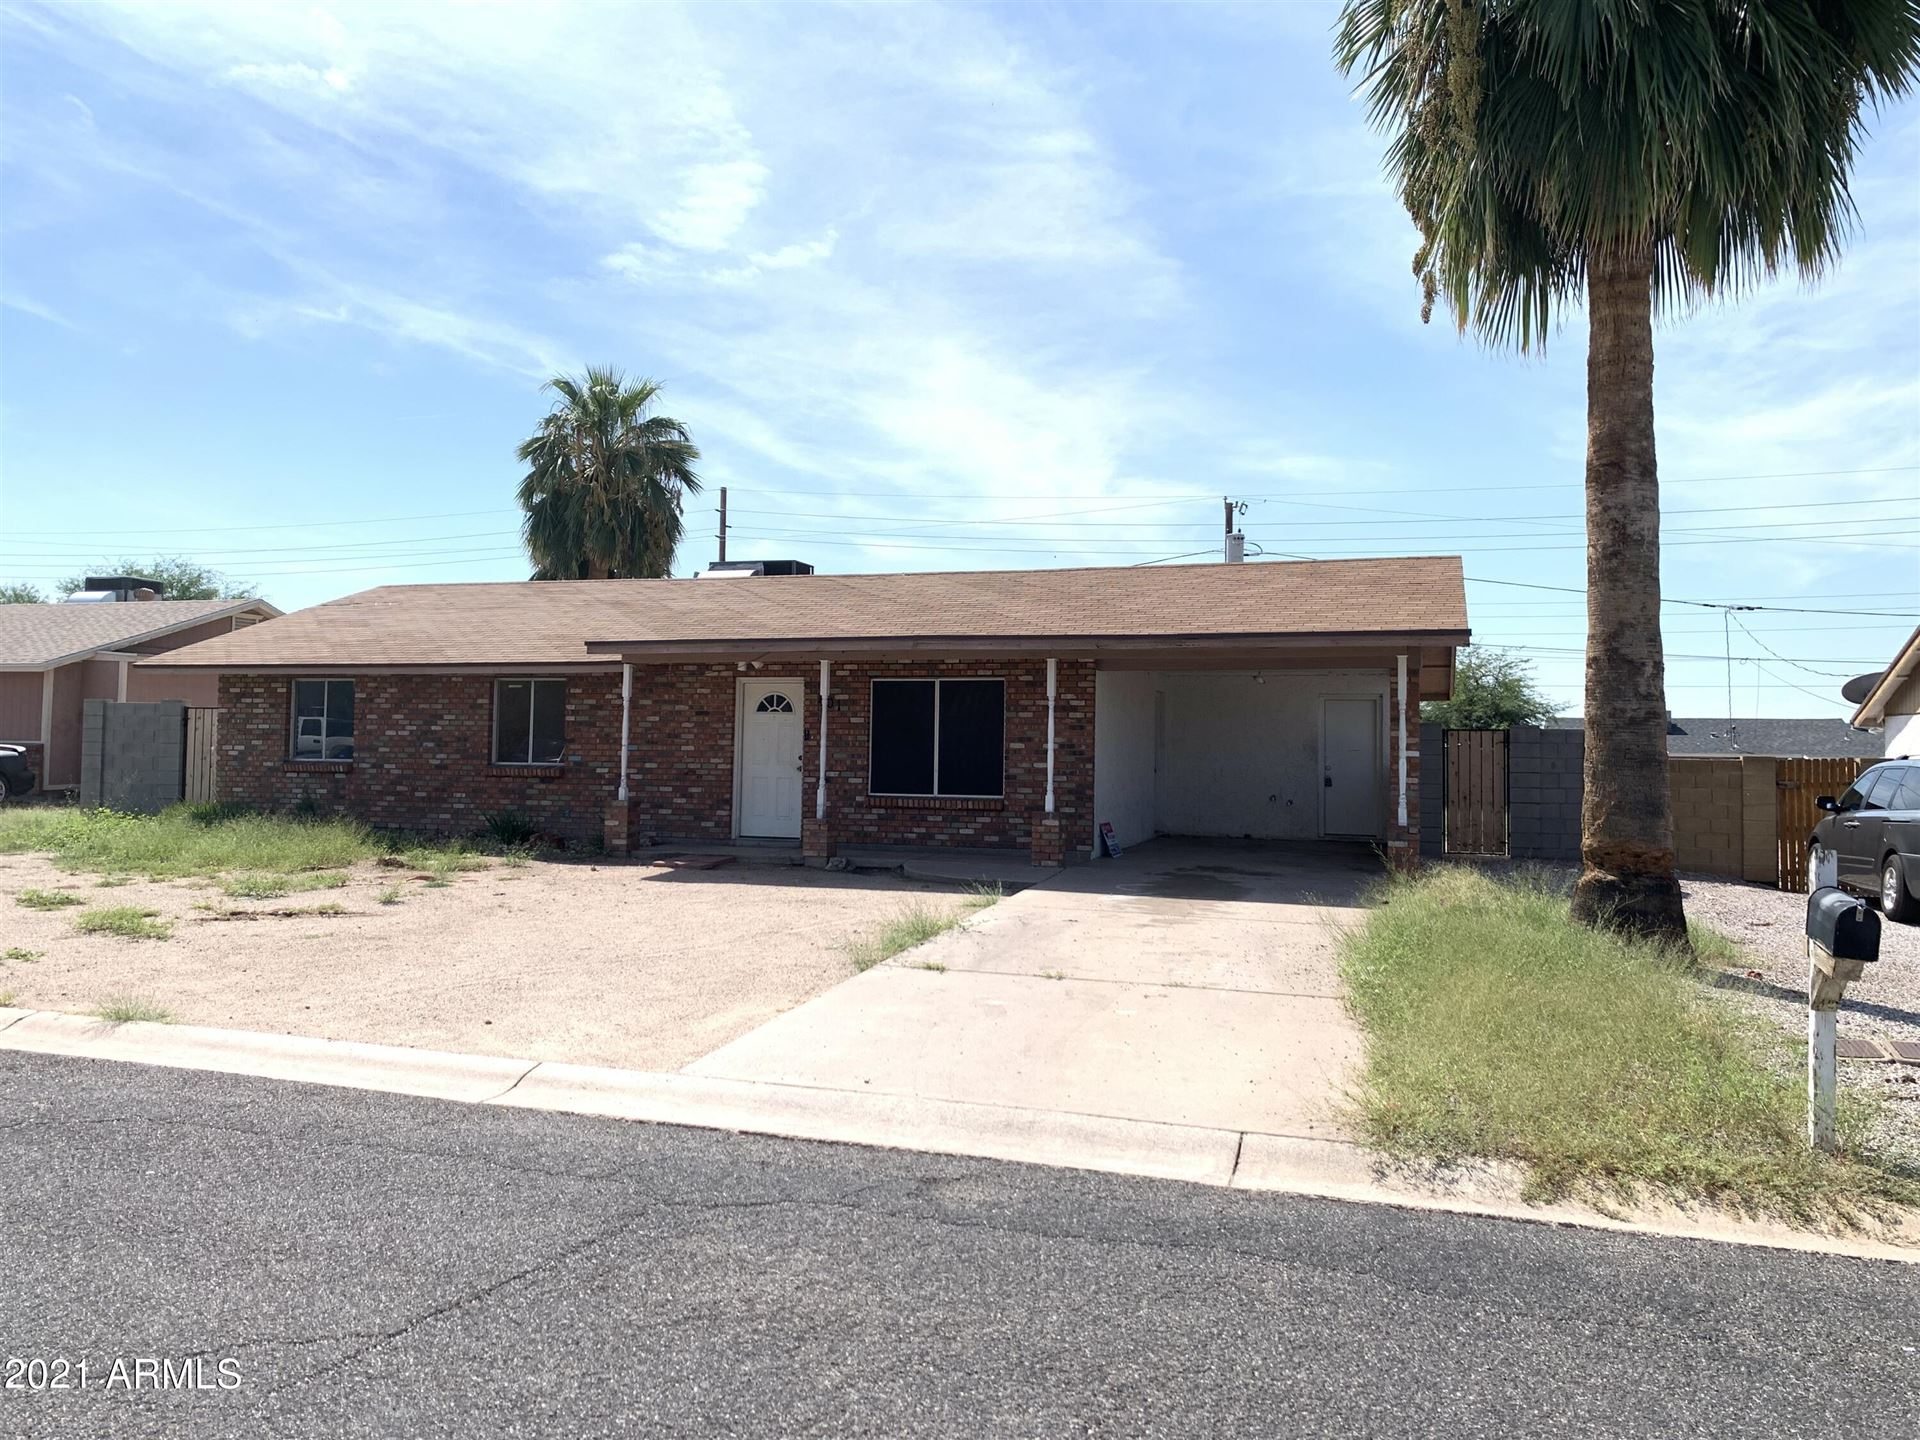 Photo of 401 W 23RD Avenue, Apache Junction, AZ 85120 (MLS # 6290603)